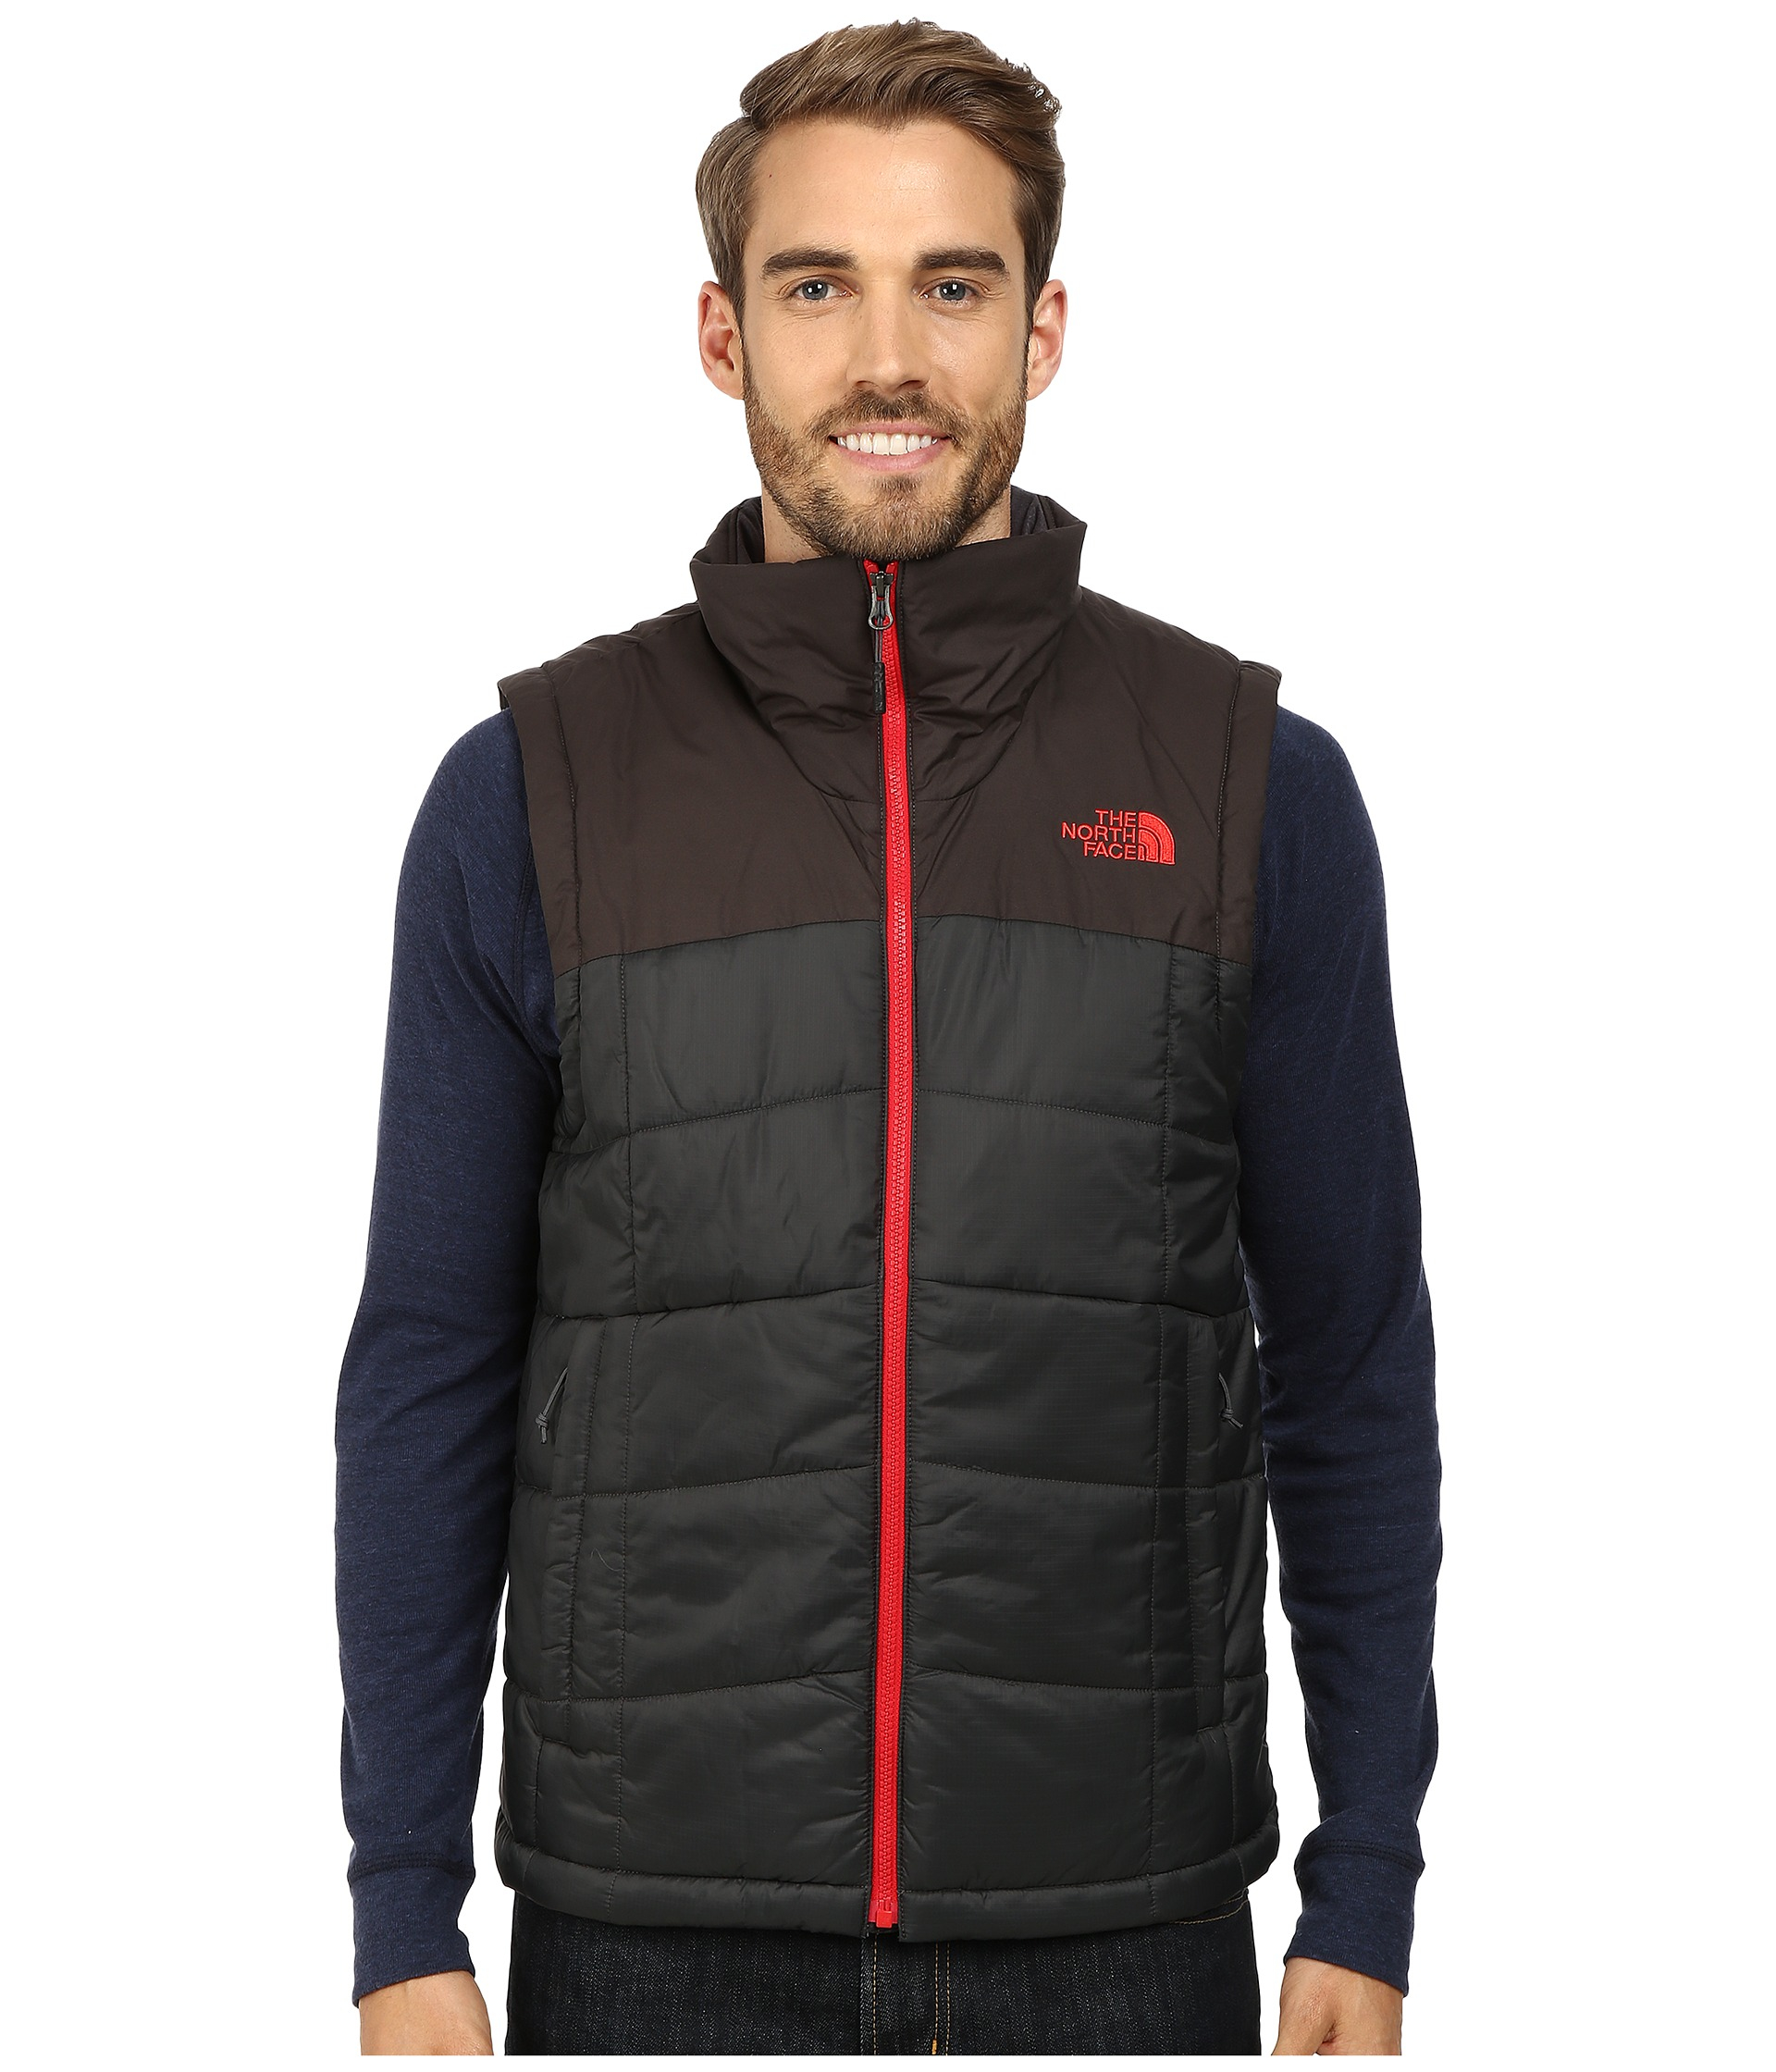 9894c1abcf Lyst - The North Face Roamer Vest in Black for Men